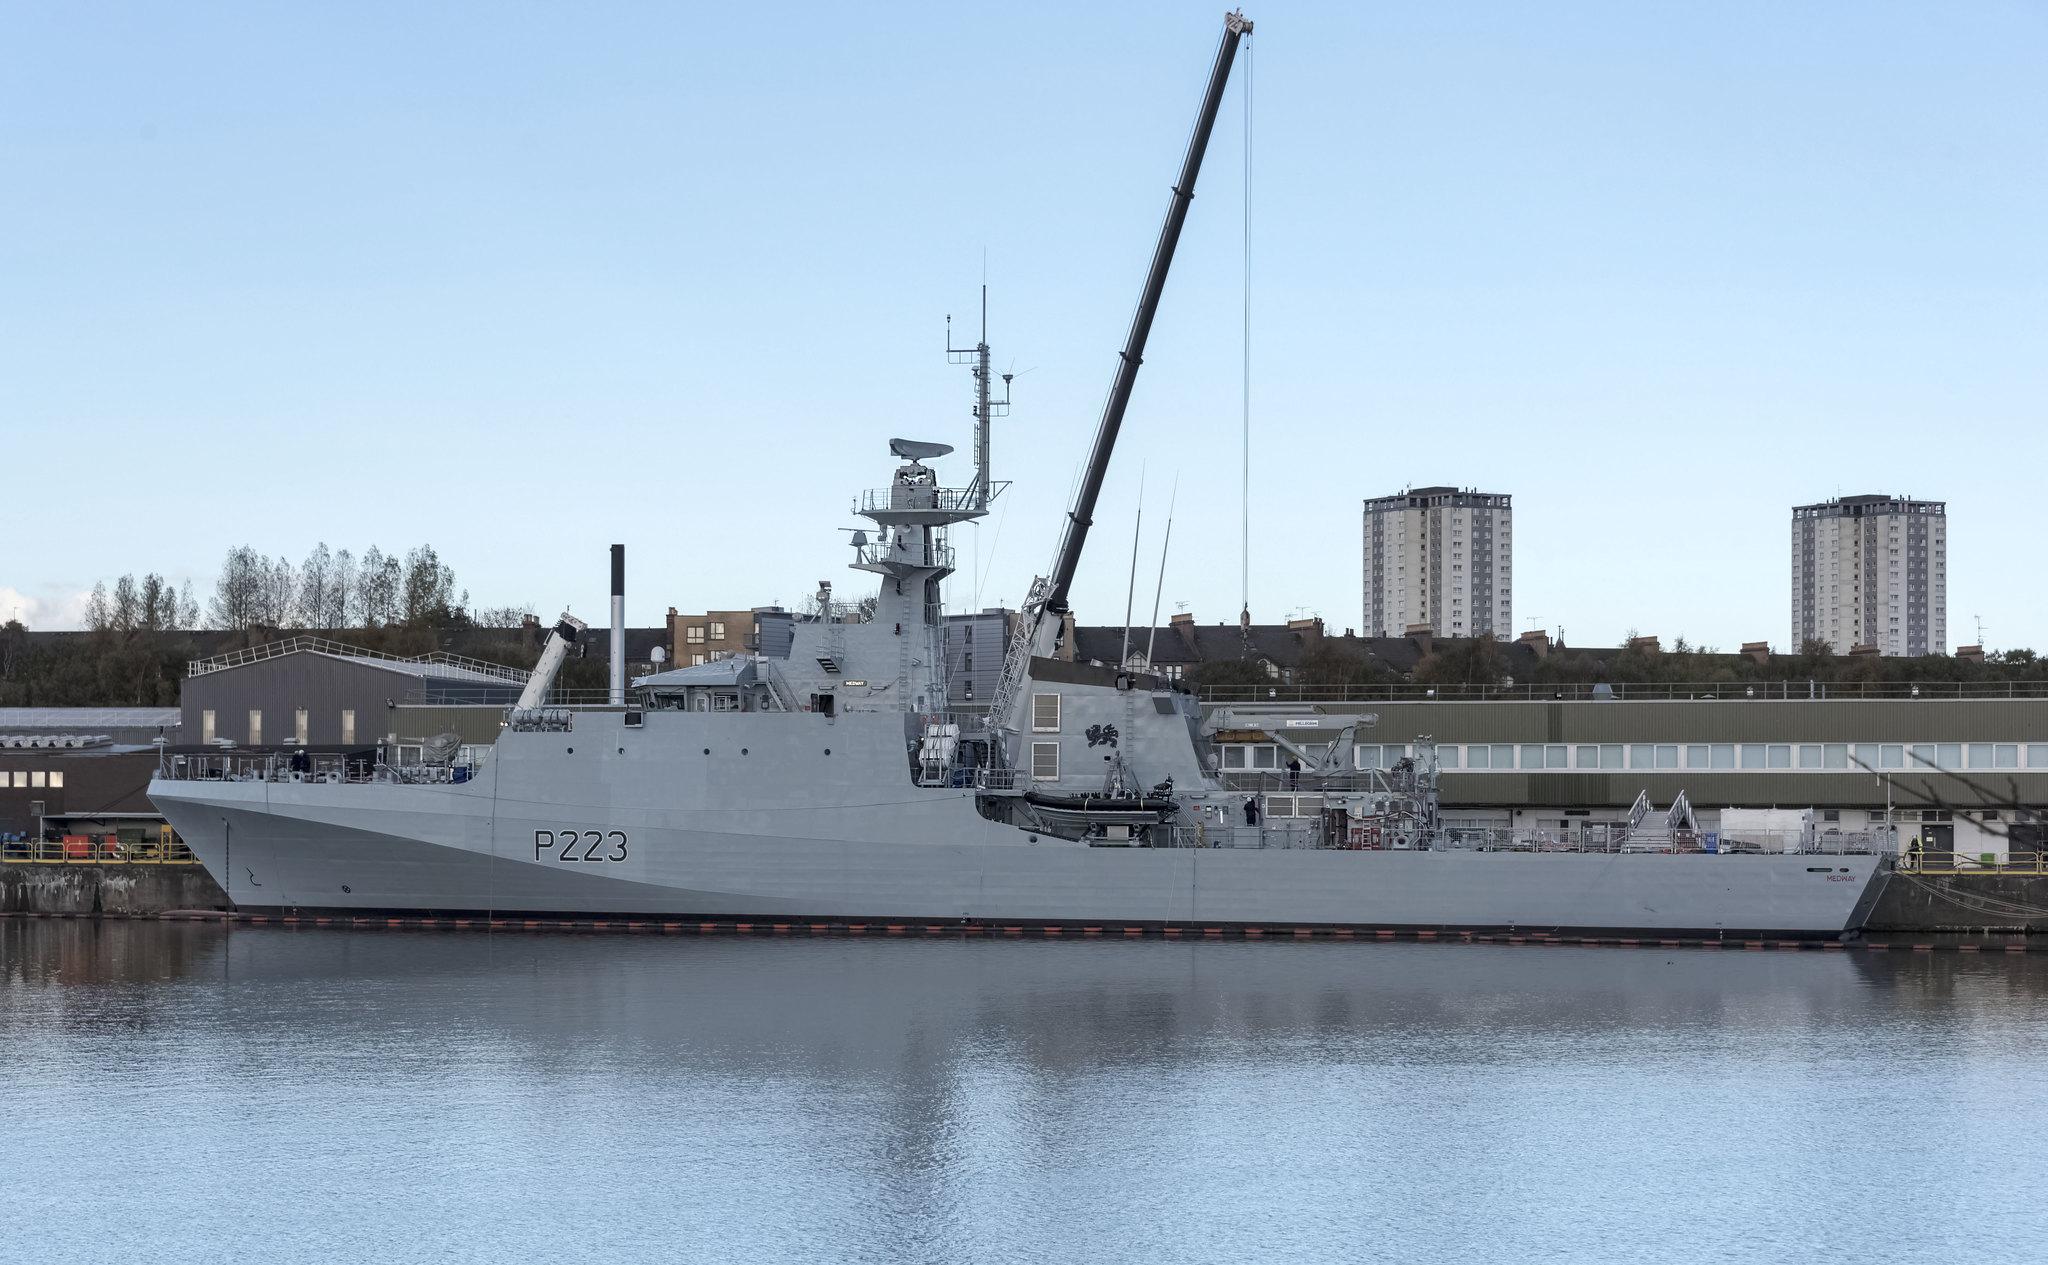 River-class Offshore Patrol Vessels (Batch 1 & 2) - Page 5 45565114712_7115283230_k